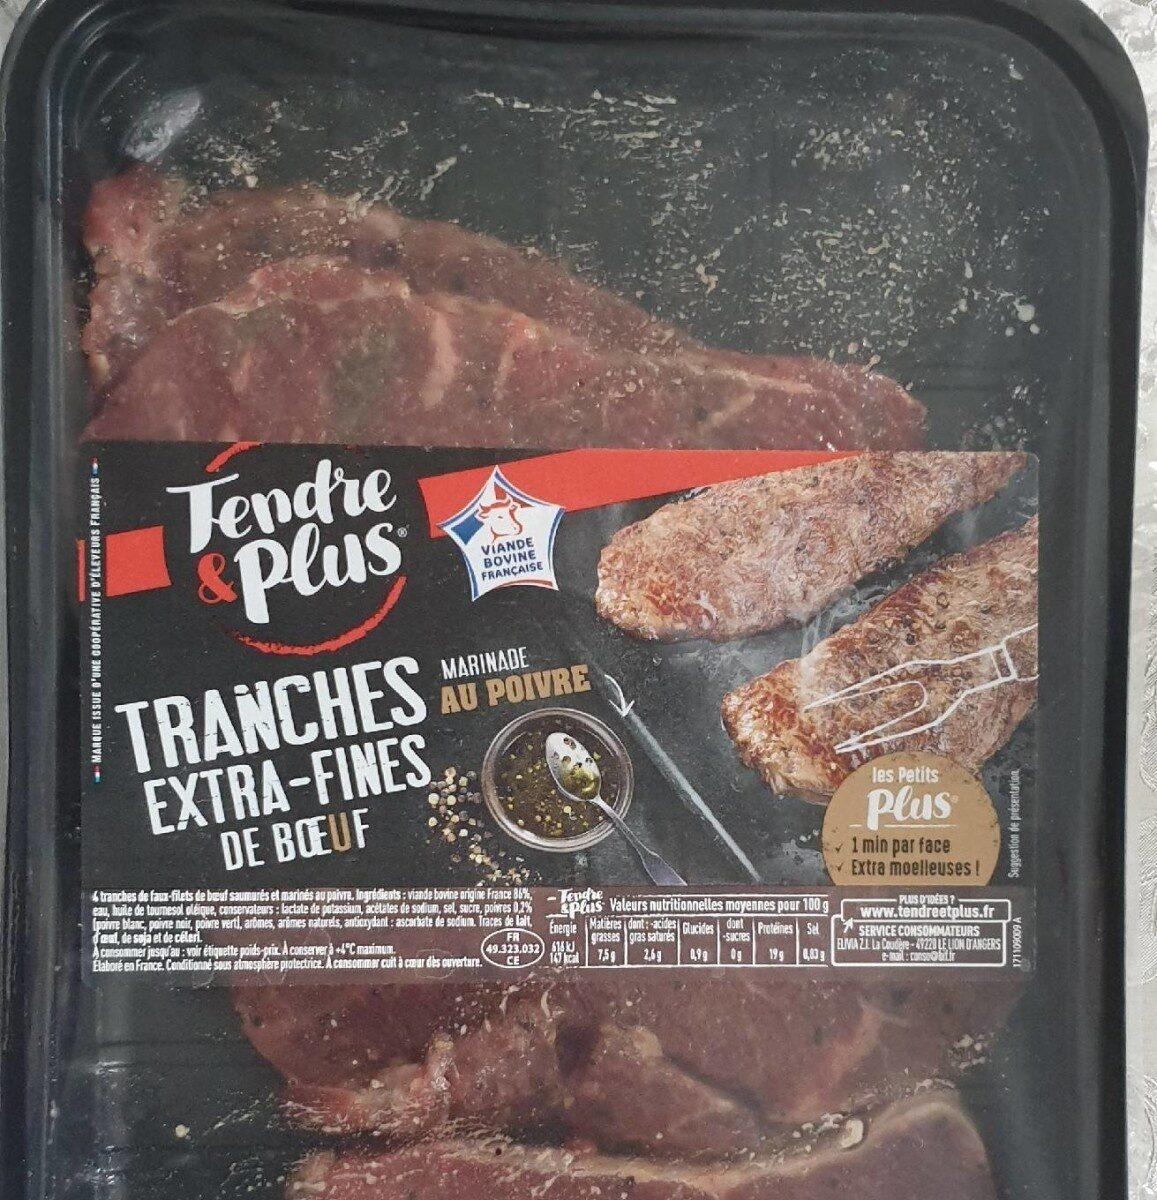 Tranches extra-fines de bœuf - Product